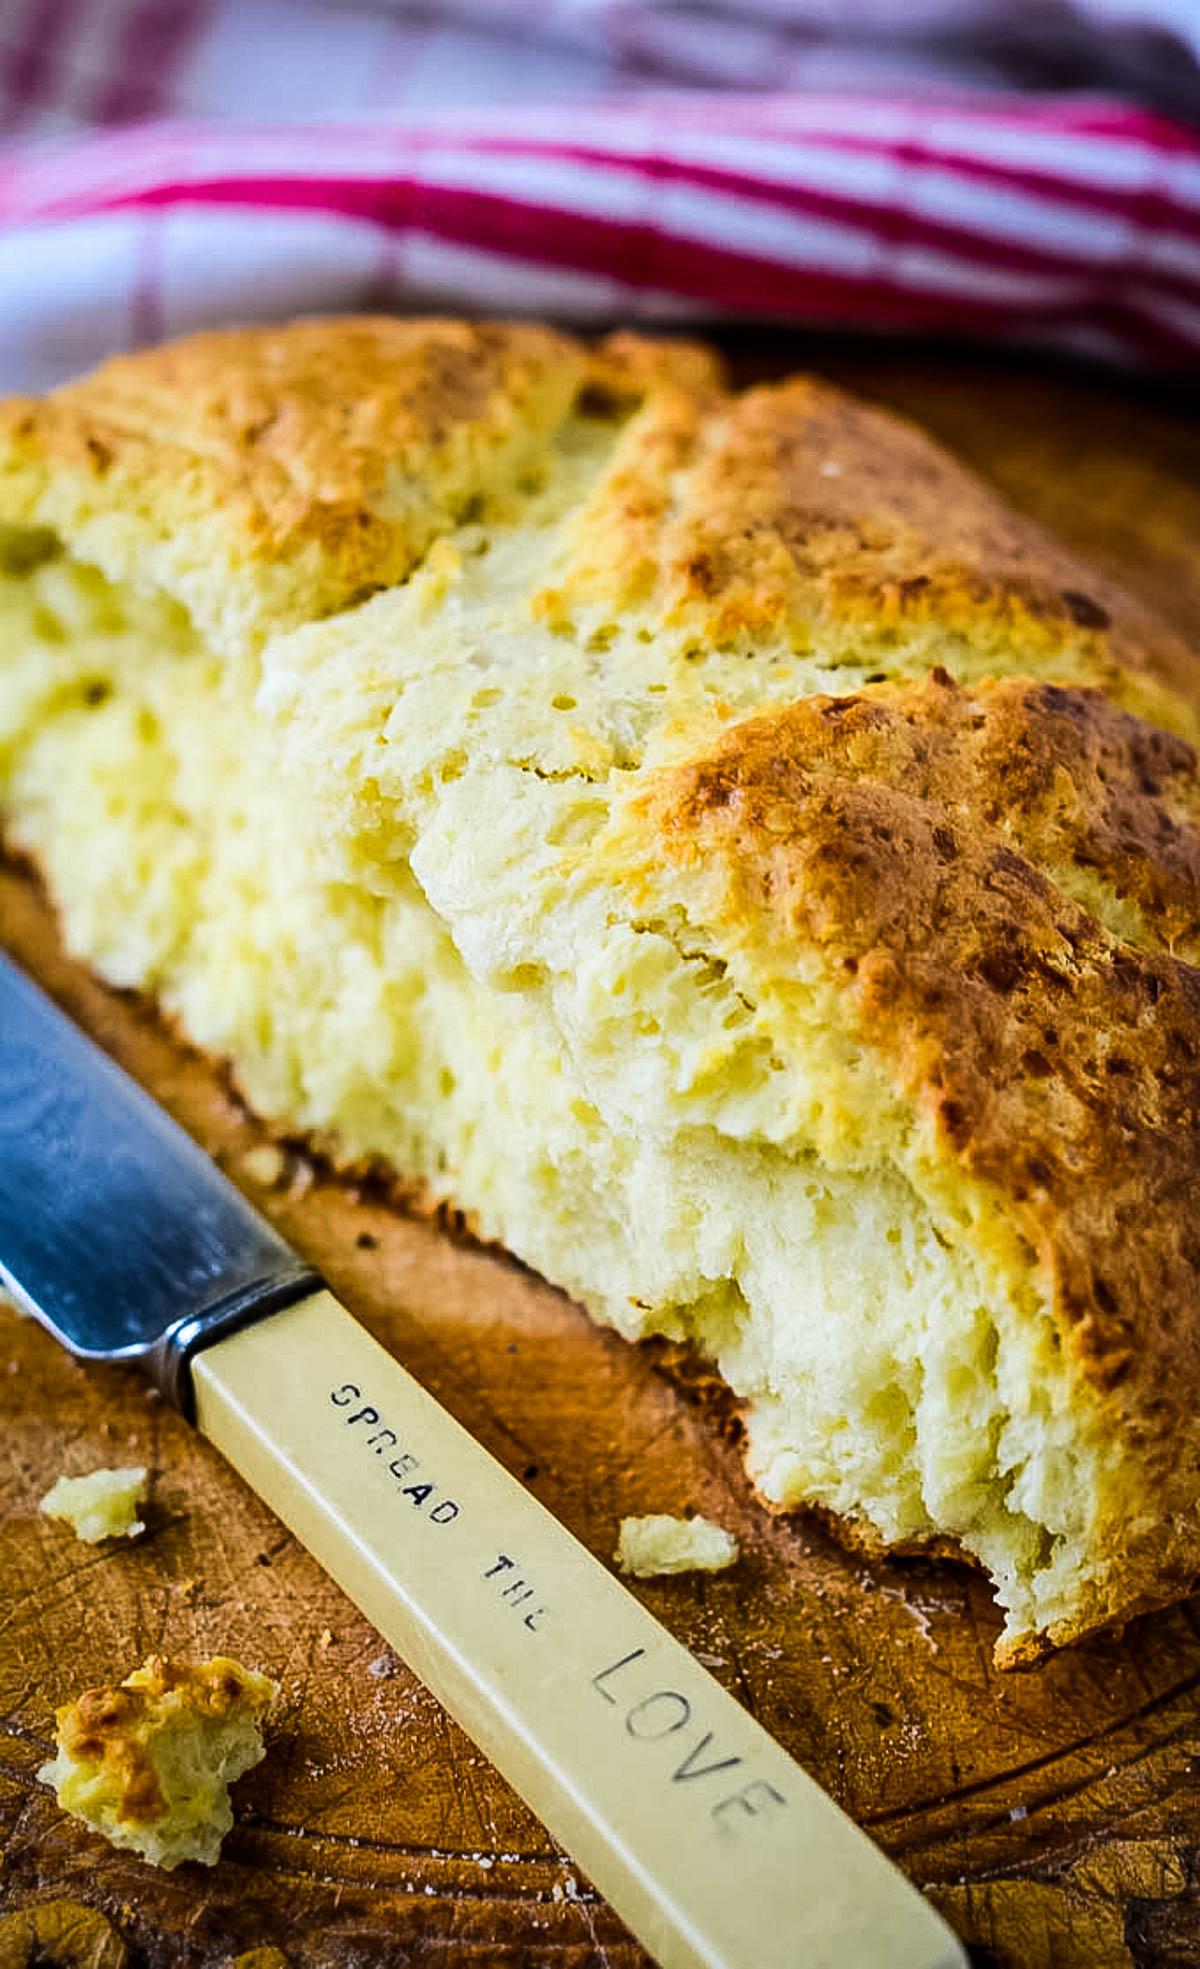 knife beside half loaf of bread